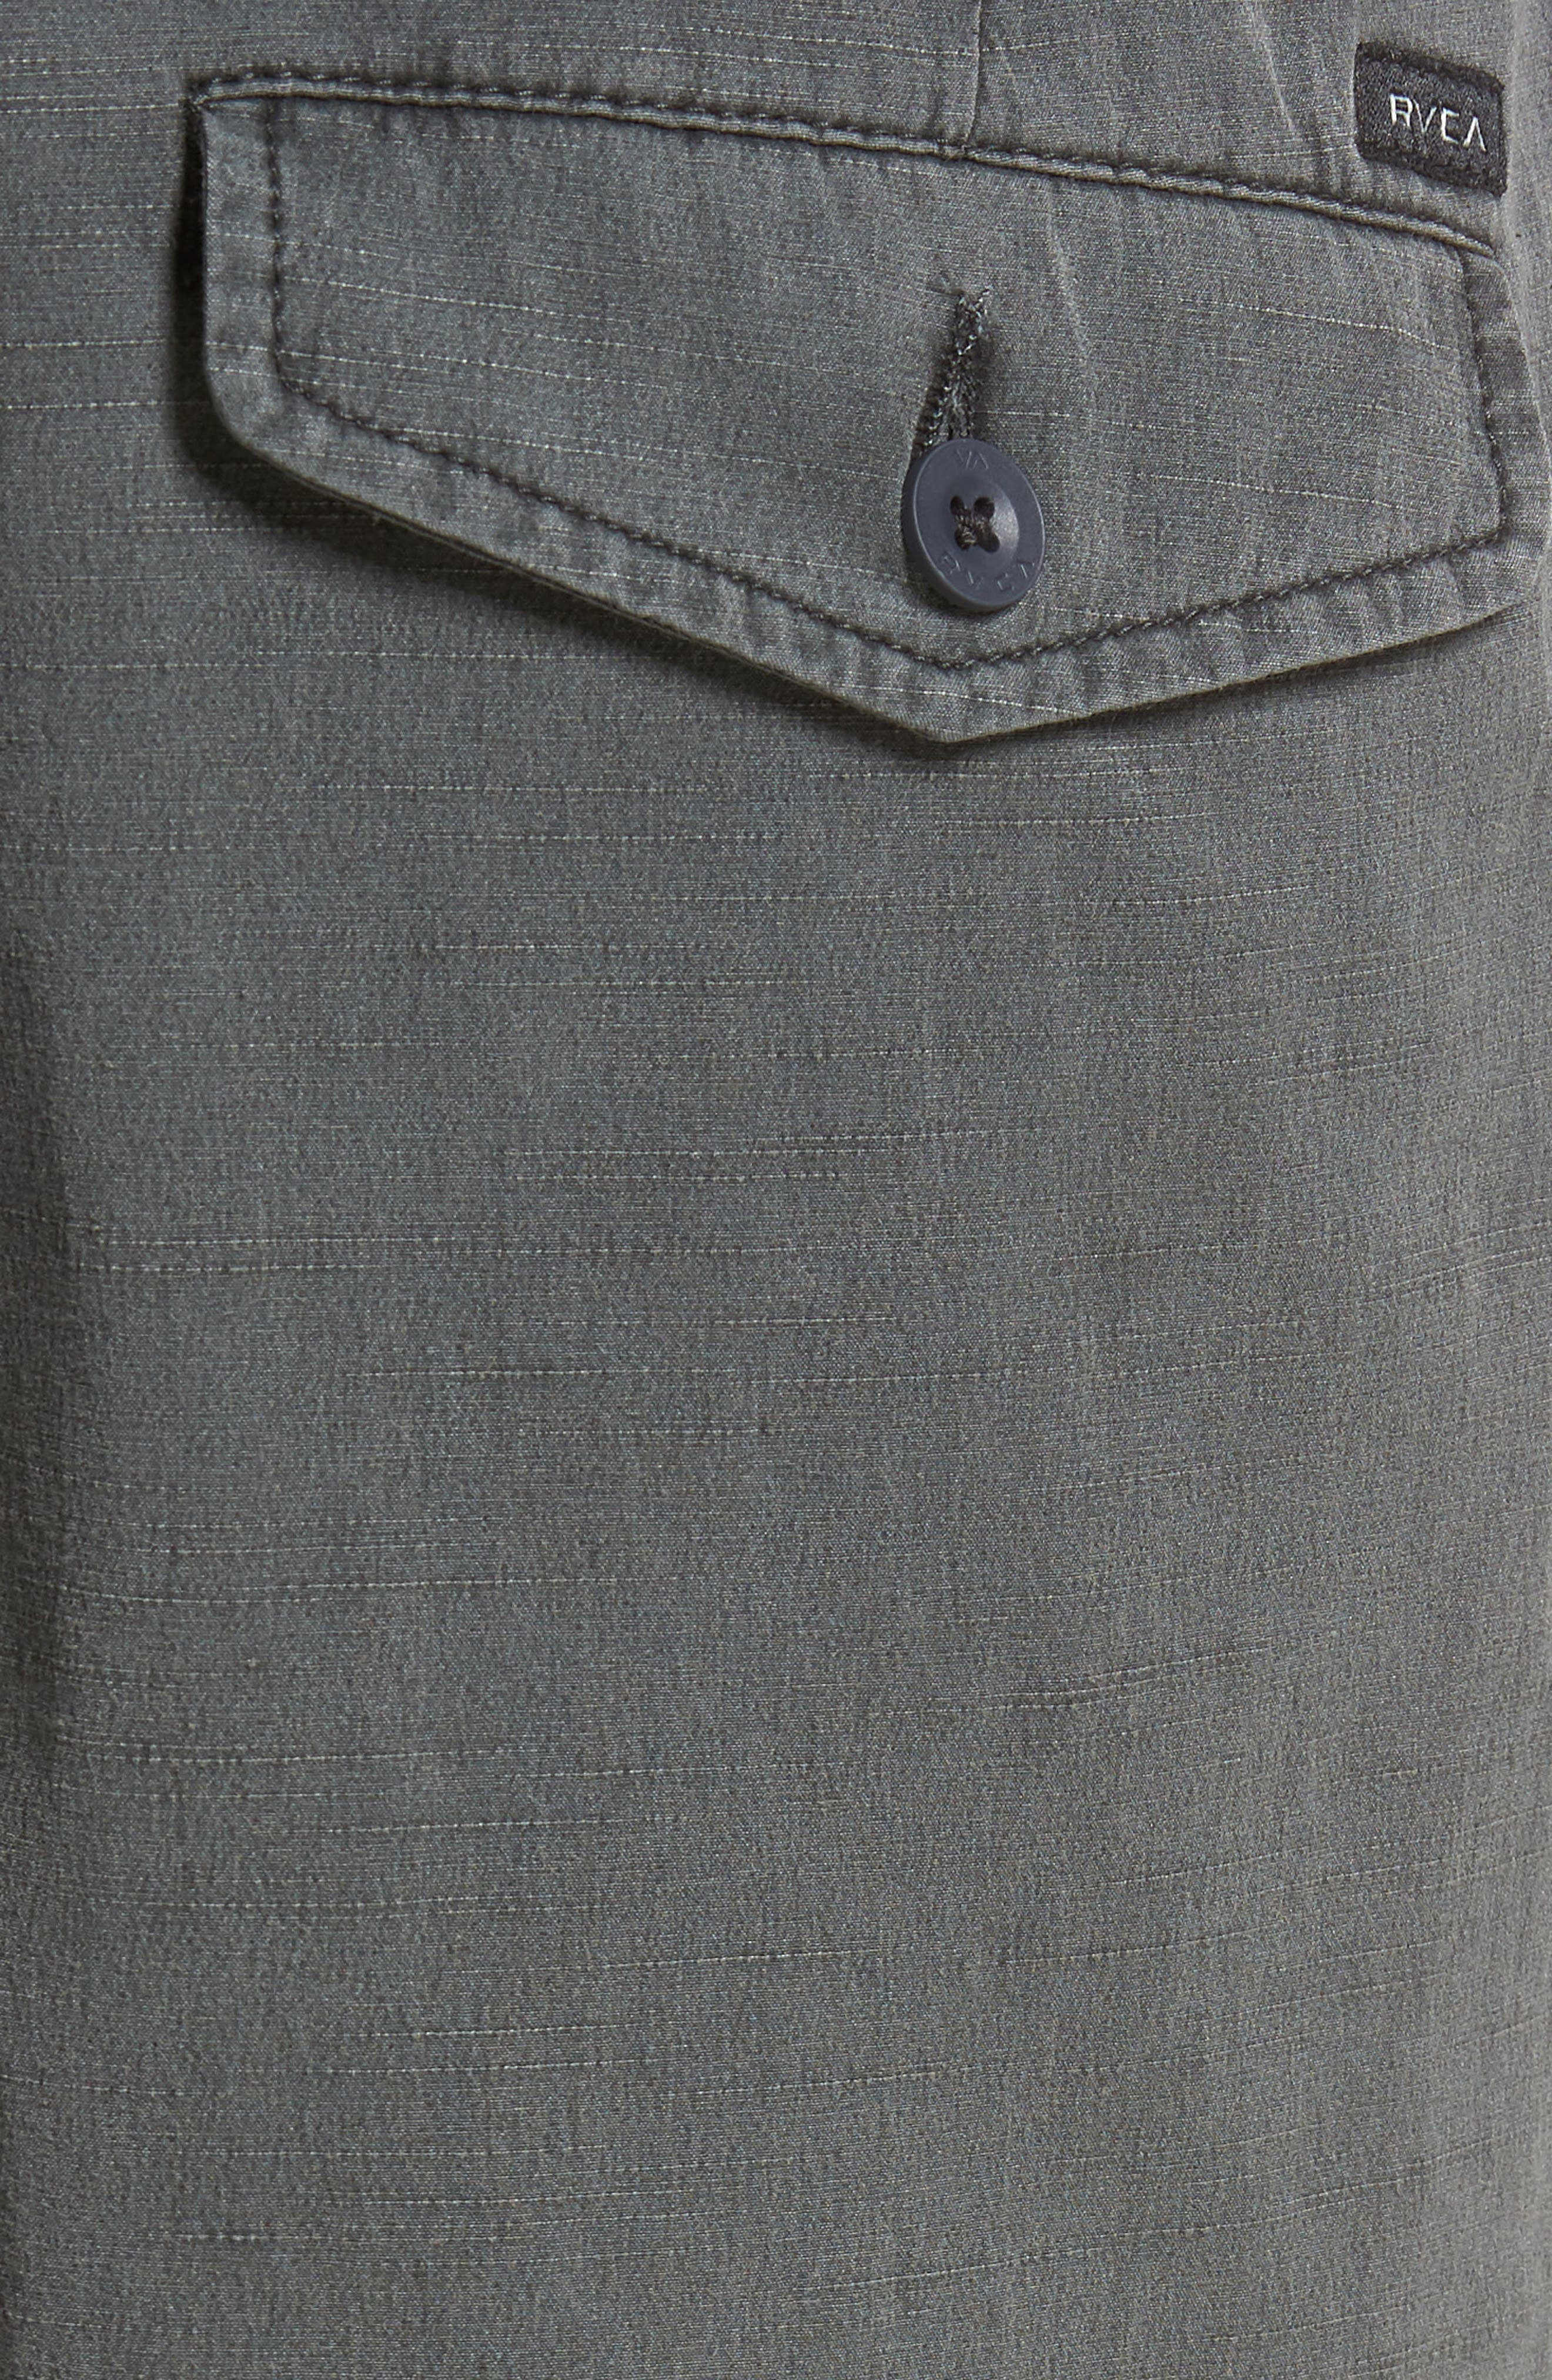 All Time Coastal SOL Hybrid Shorts,                             Alternate thumbnail 5, color,                             076